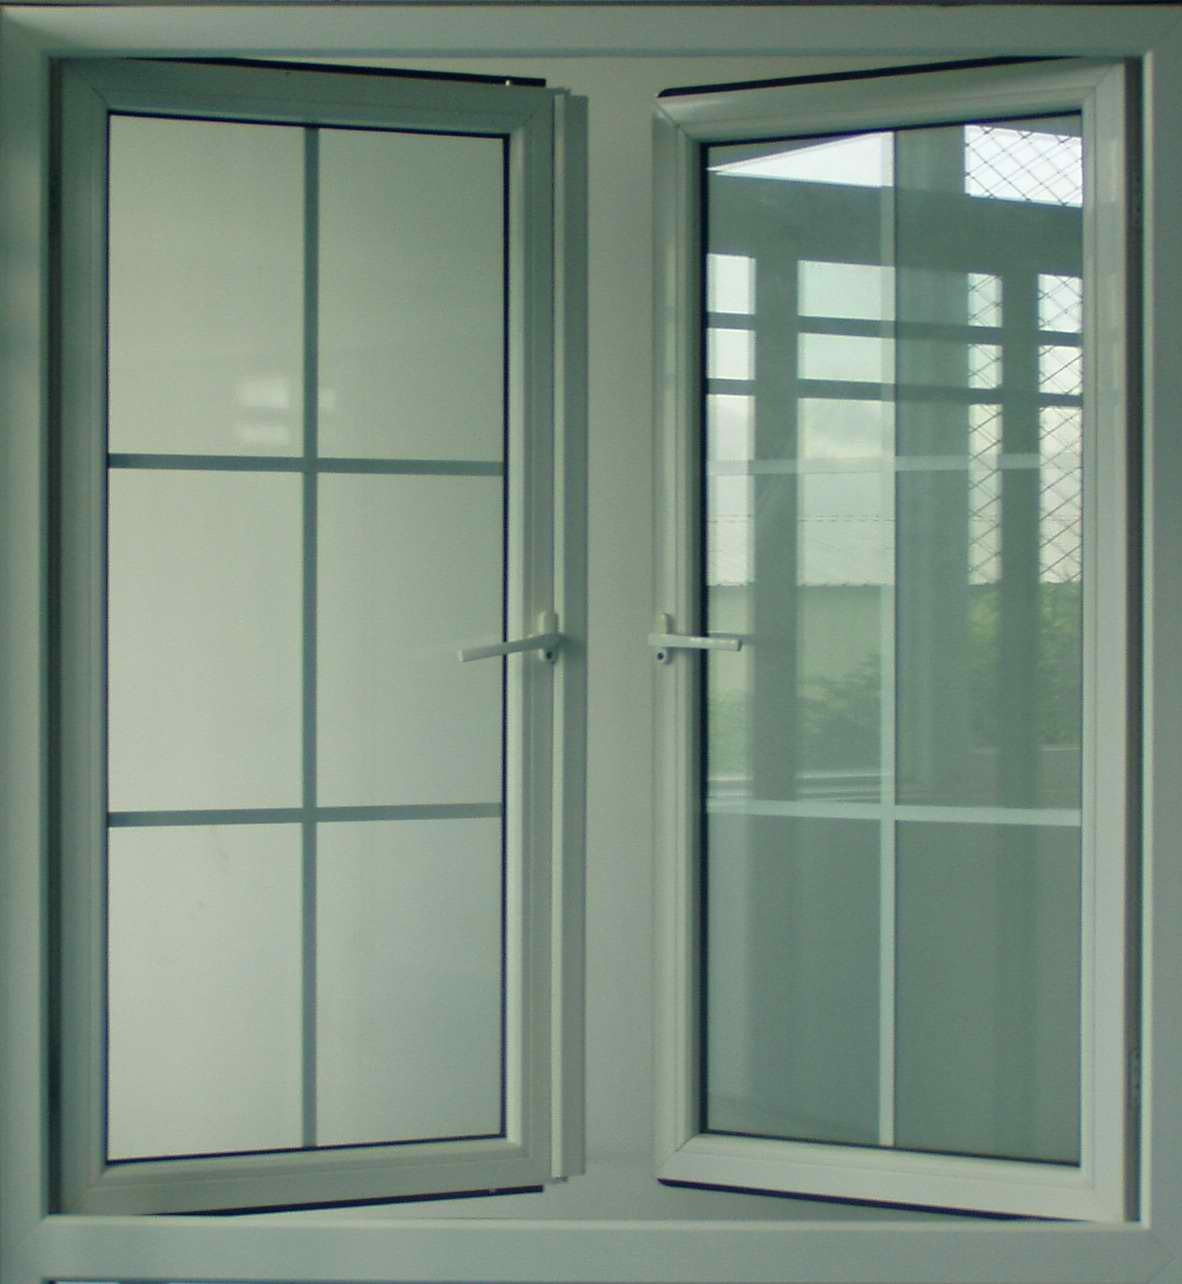 China aluminum swing in casement windows p1060001 for Metal windows